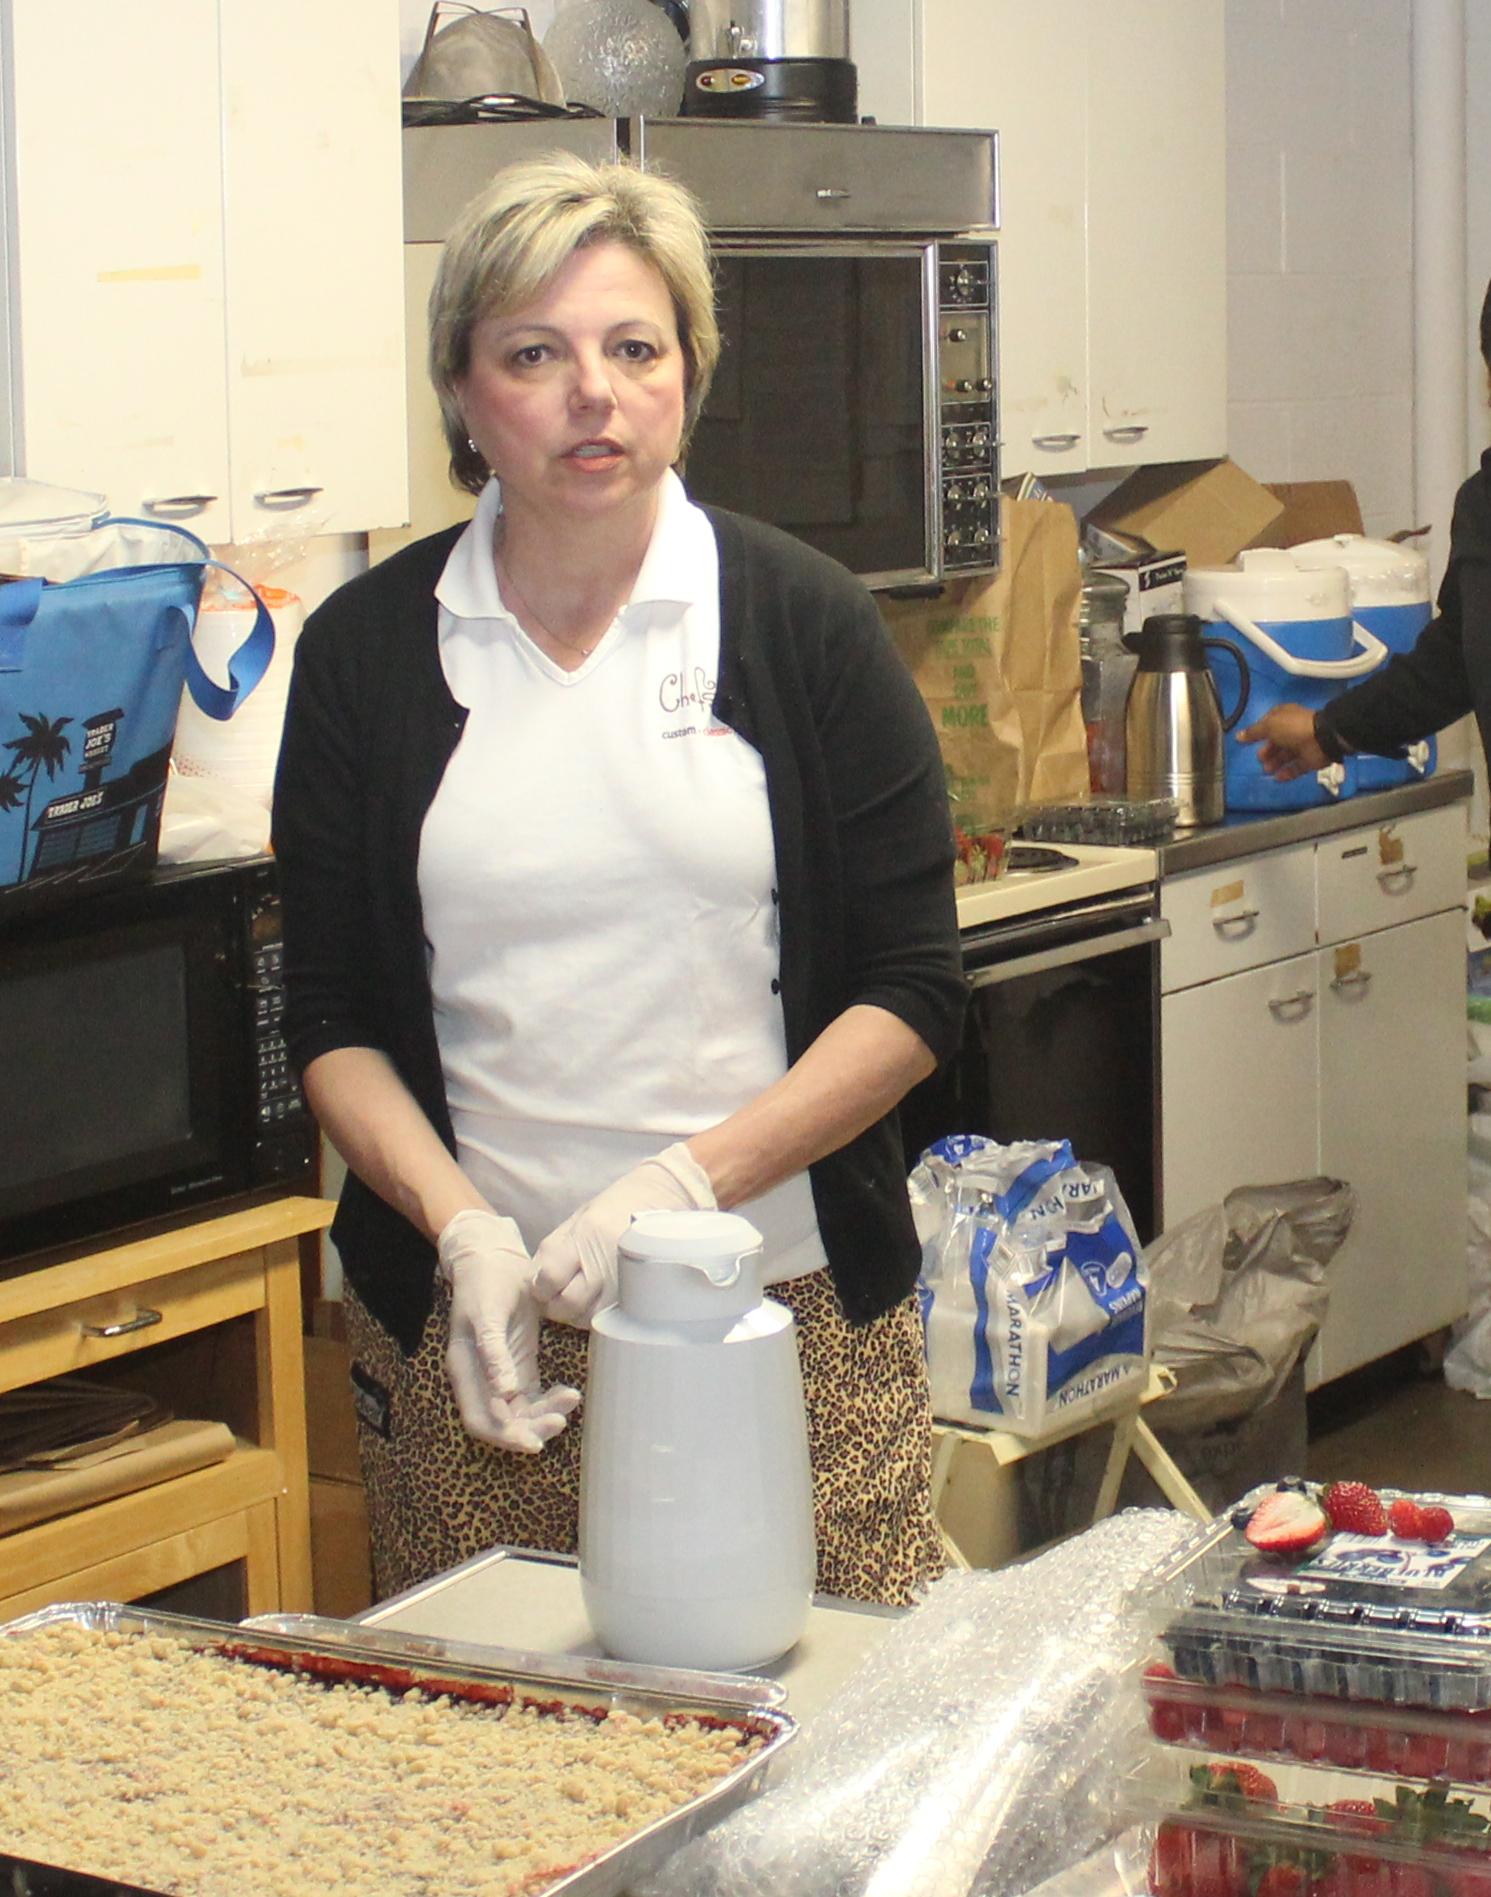 3-Chef-Barta-Prepping-for-Intermission